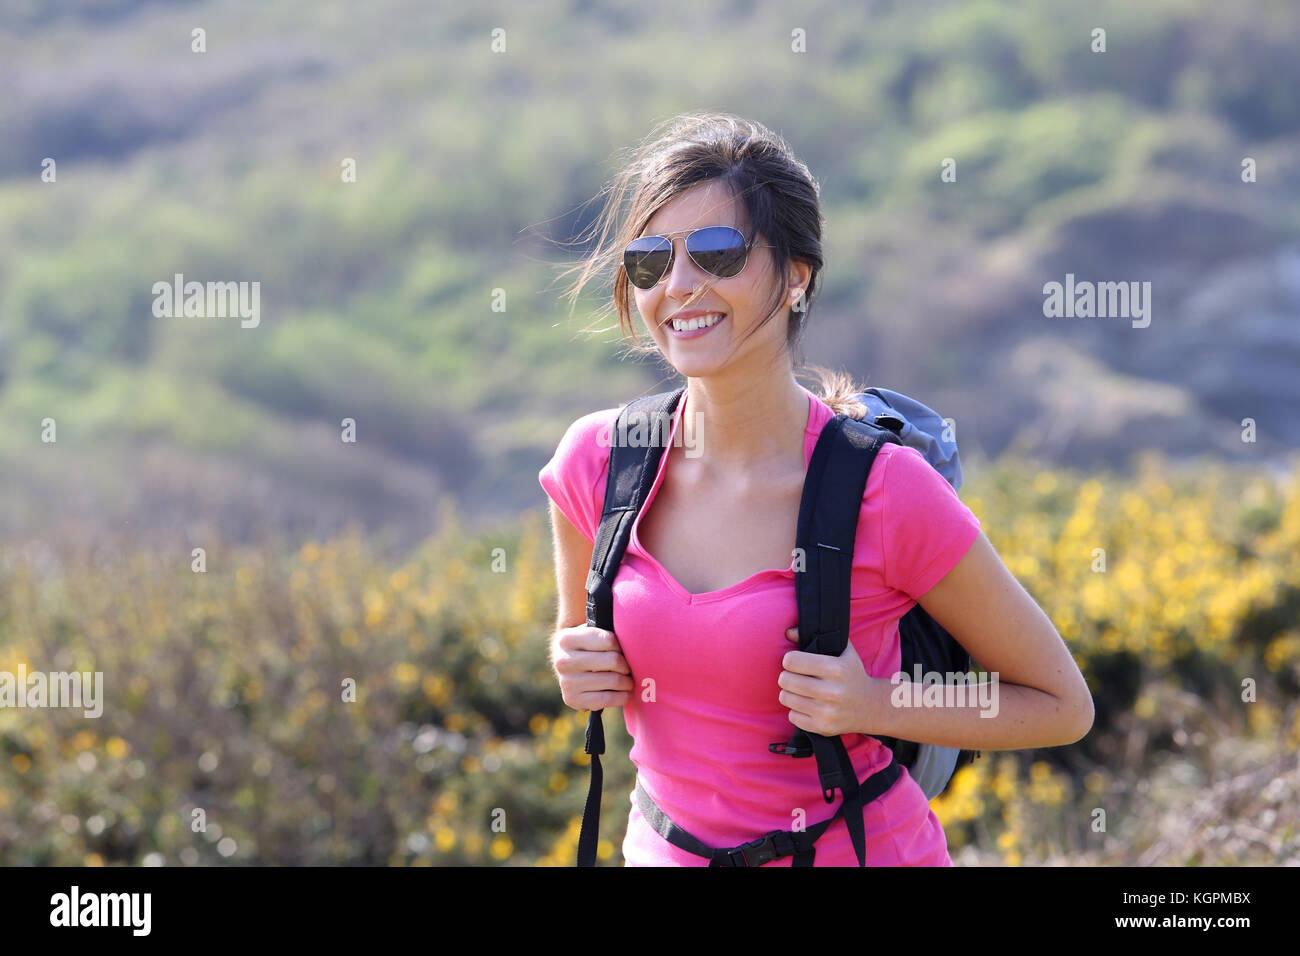 Randonneur smiling girl walking in garden Photo Stock